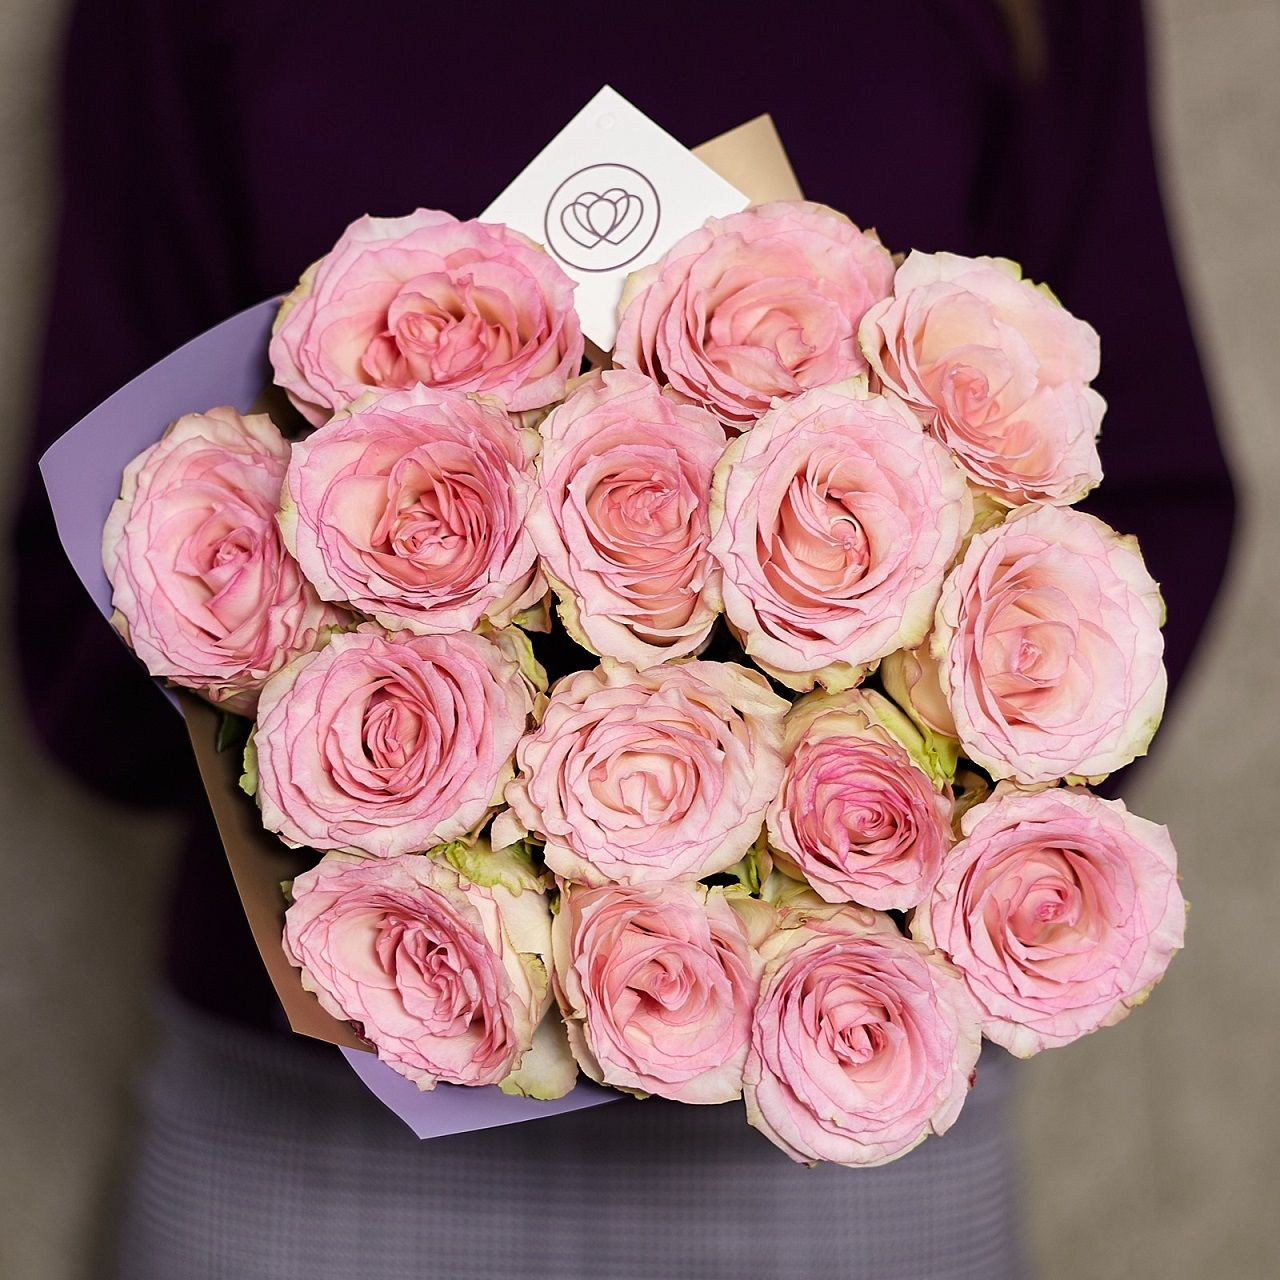 15 нежно-розовых роз 40 см Premium фото